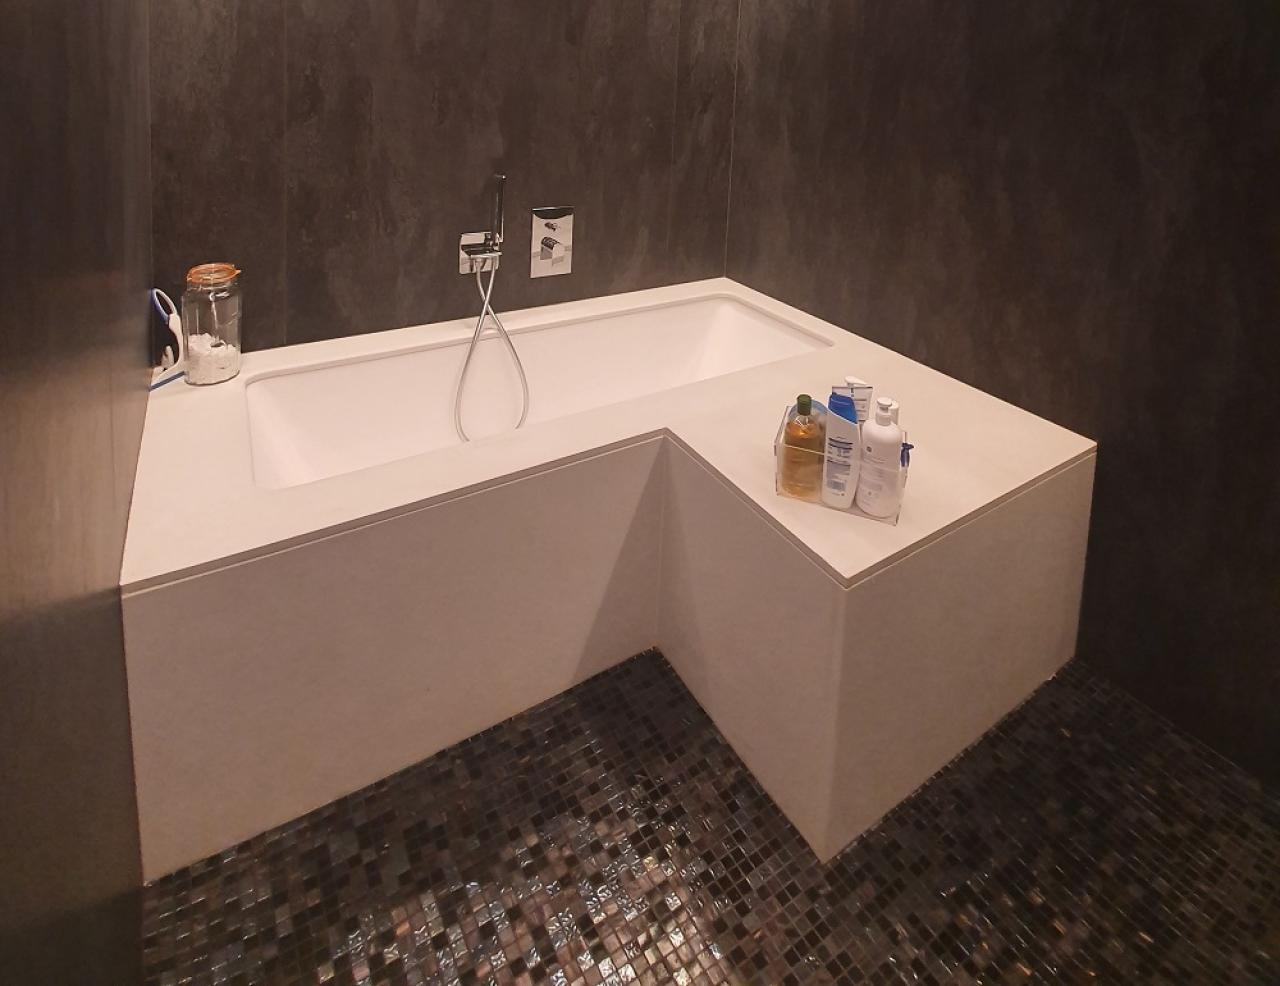 Vasche Idromassaggio Misure E Prezzi vasca da bagno su misura - wellness a vicenza | fratelli